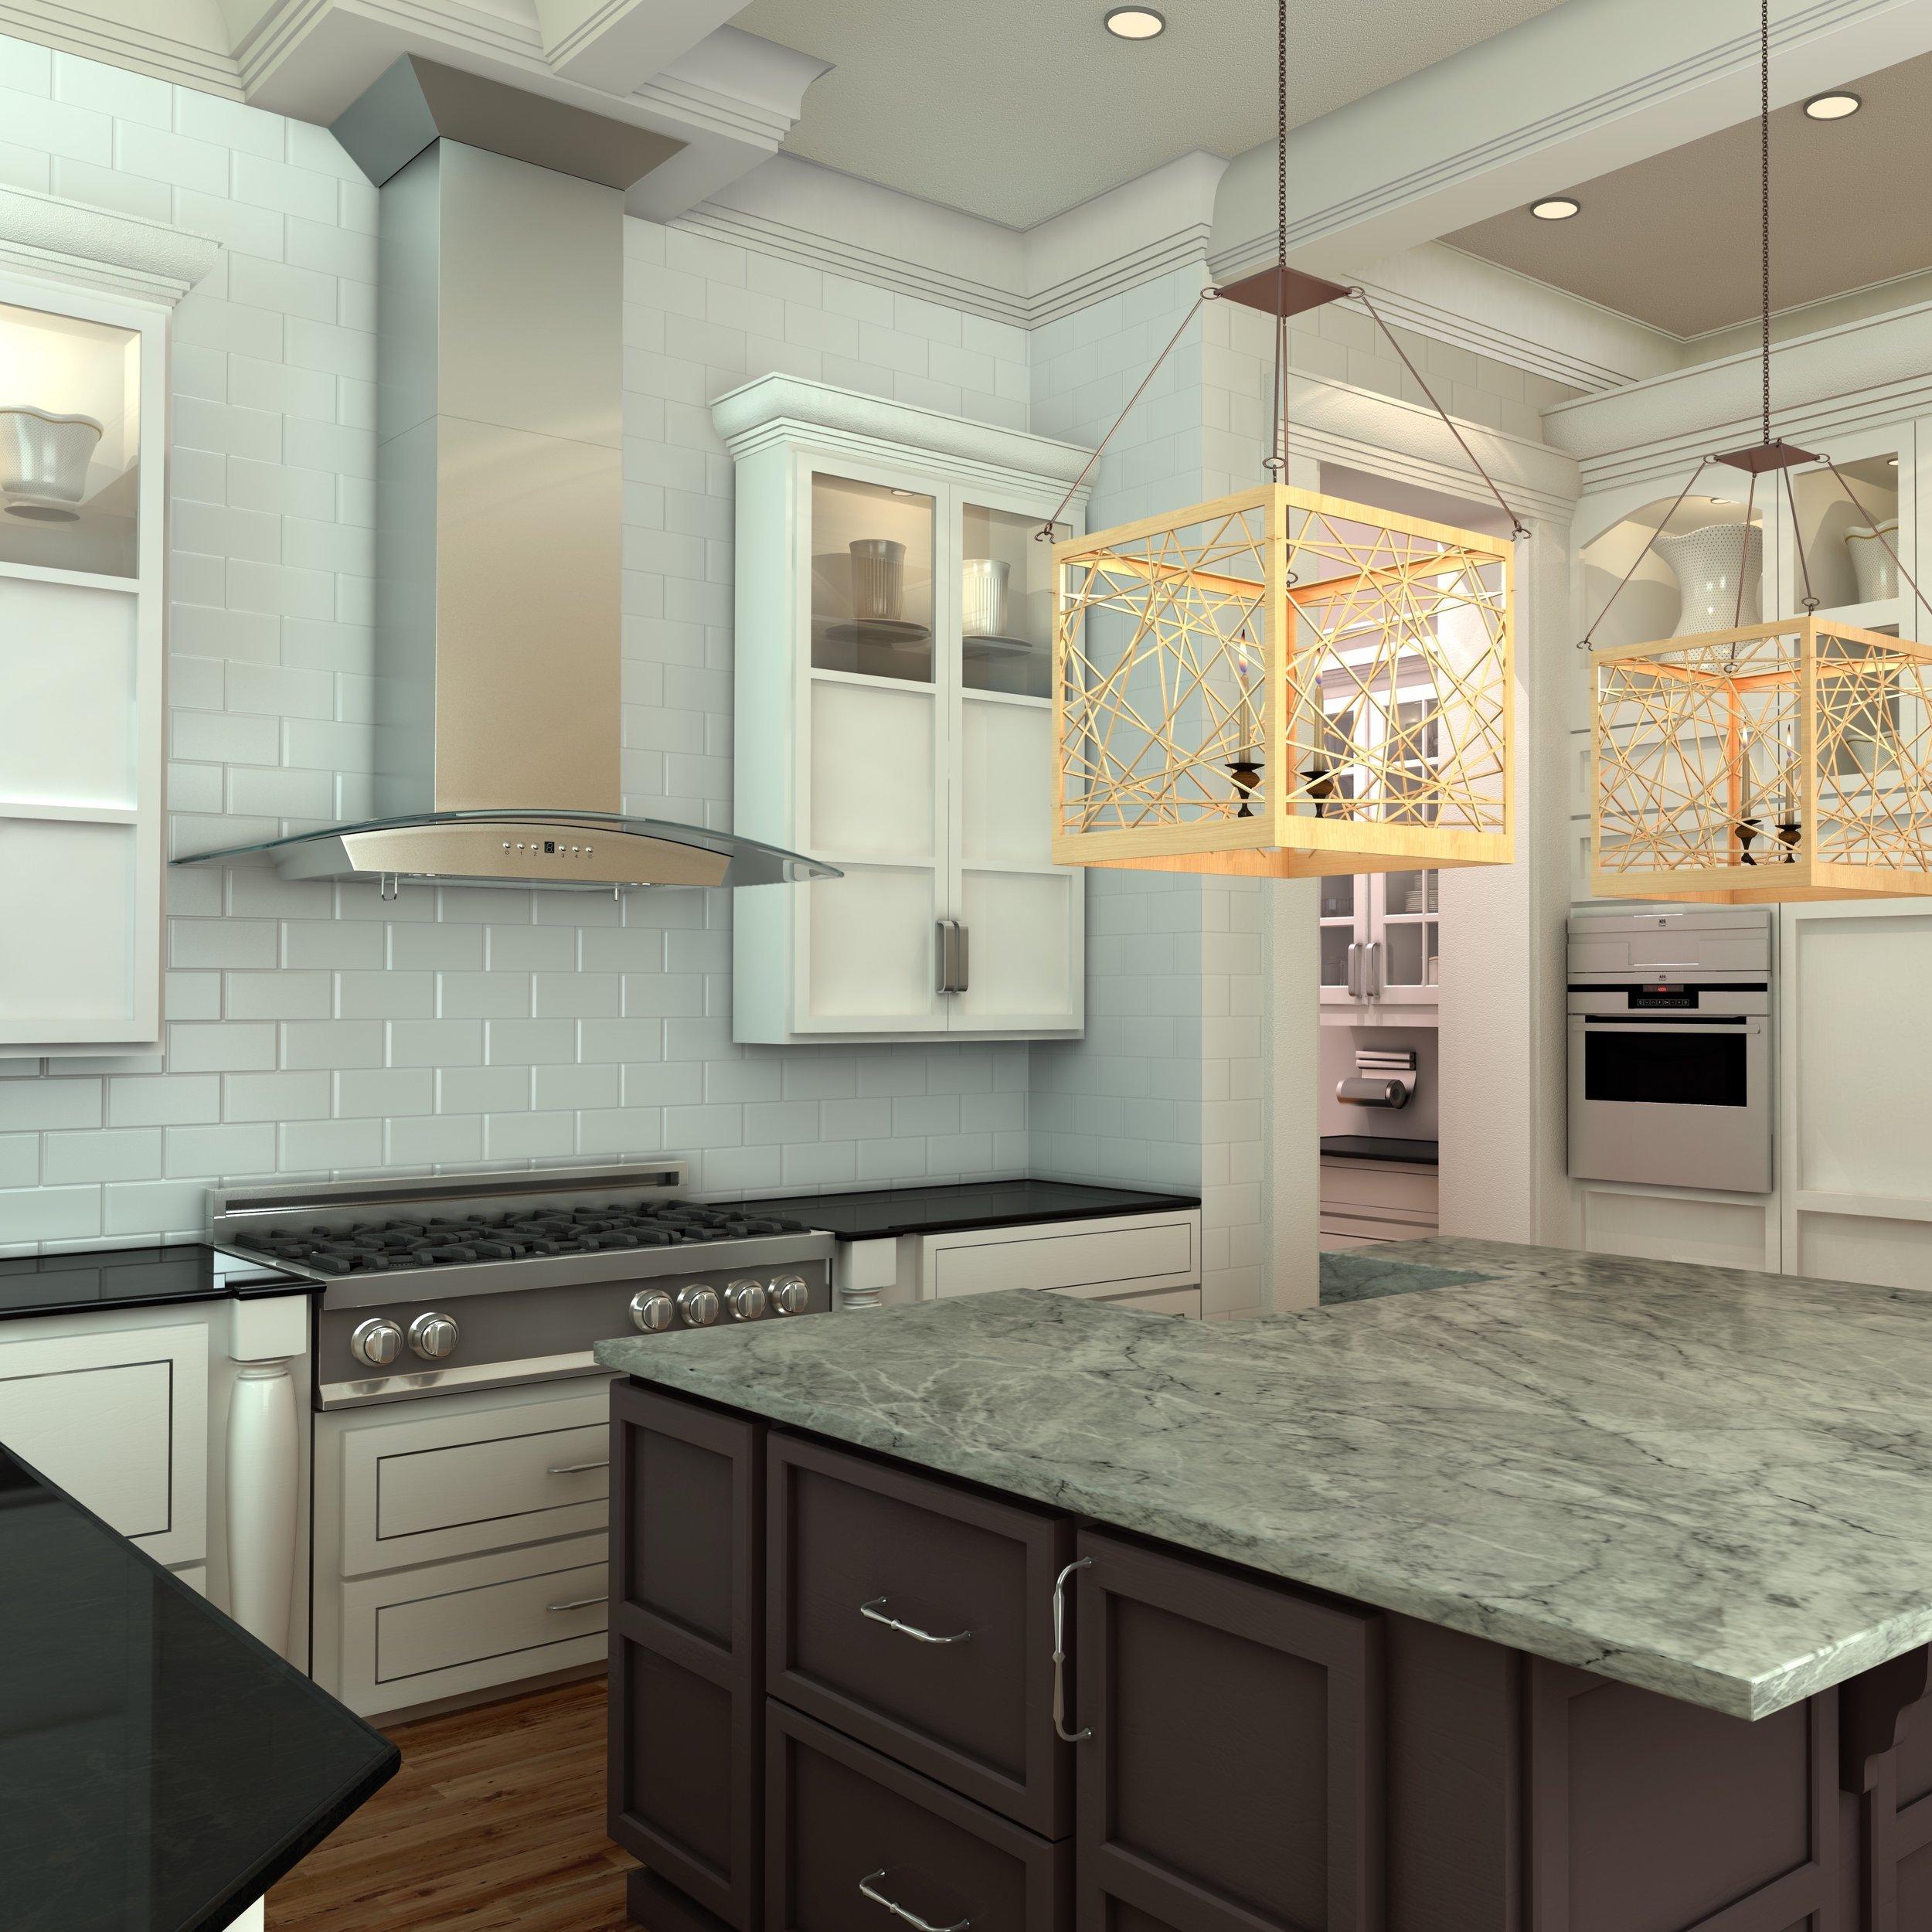 zline-stainless-steel-wall-mounted-range-hood-KZ-kitchen 1.jpeg